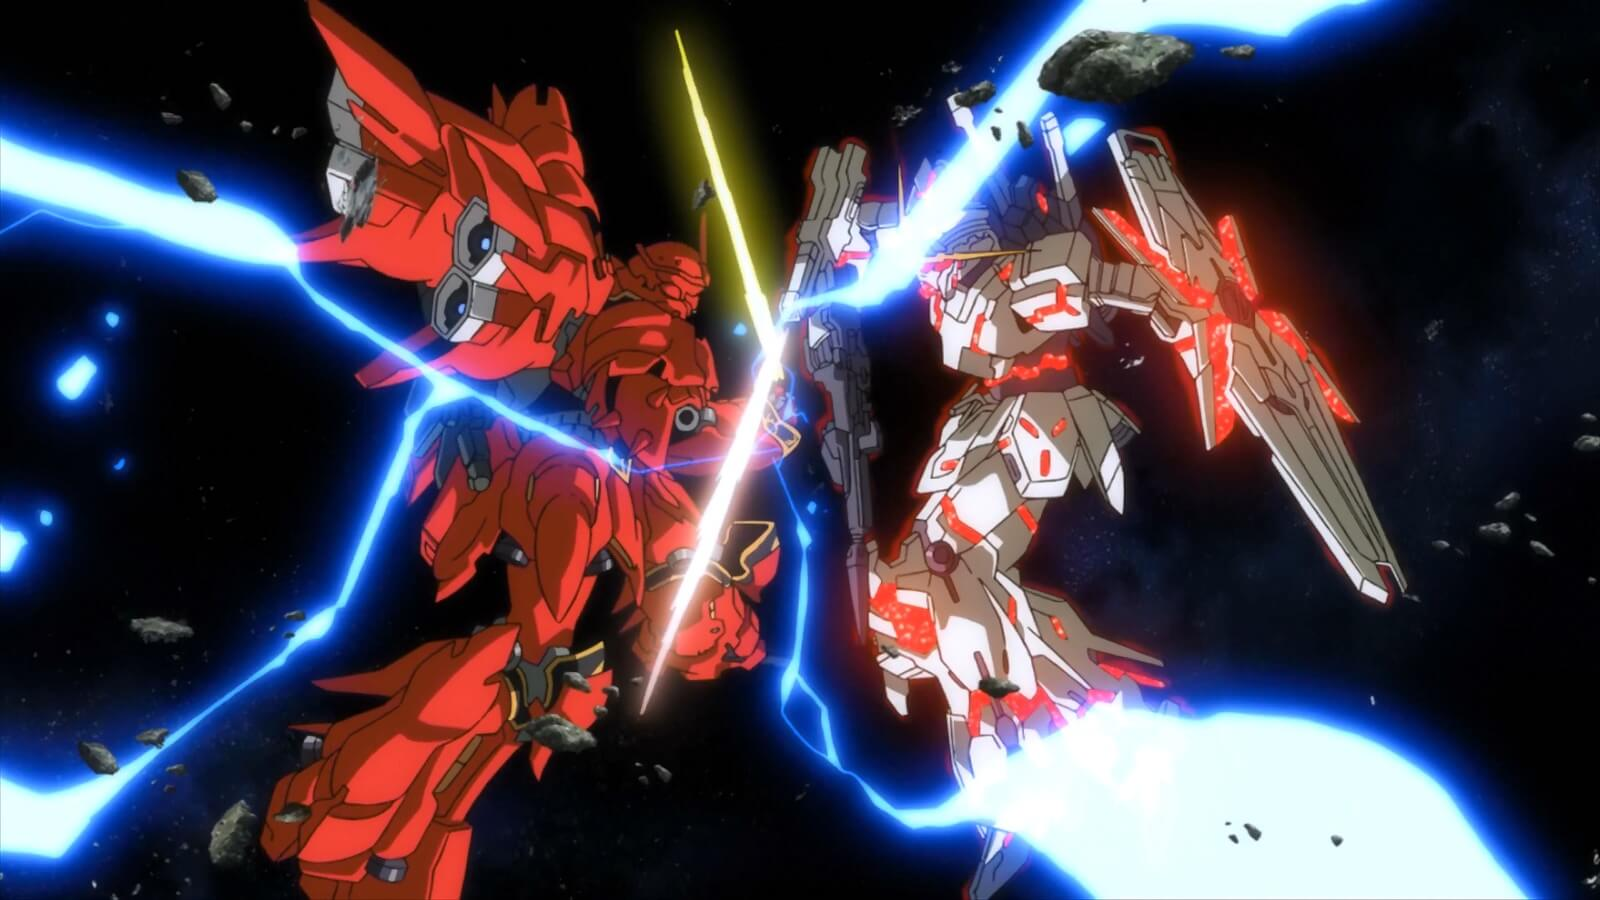 Mobile Suit Gundam UC Bande Dessinée Termina | Manga